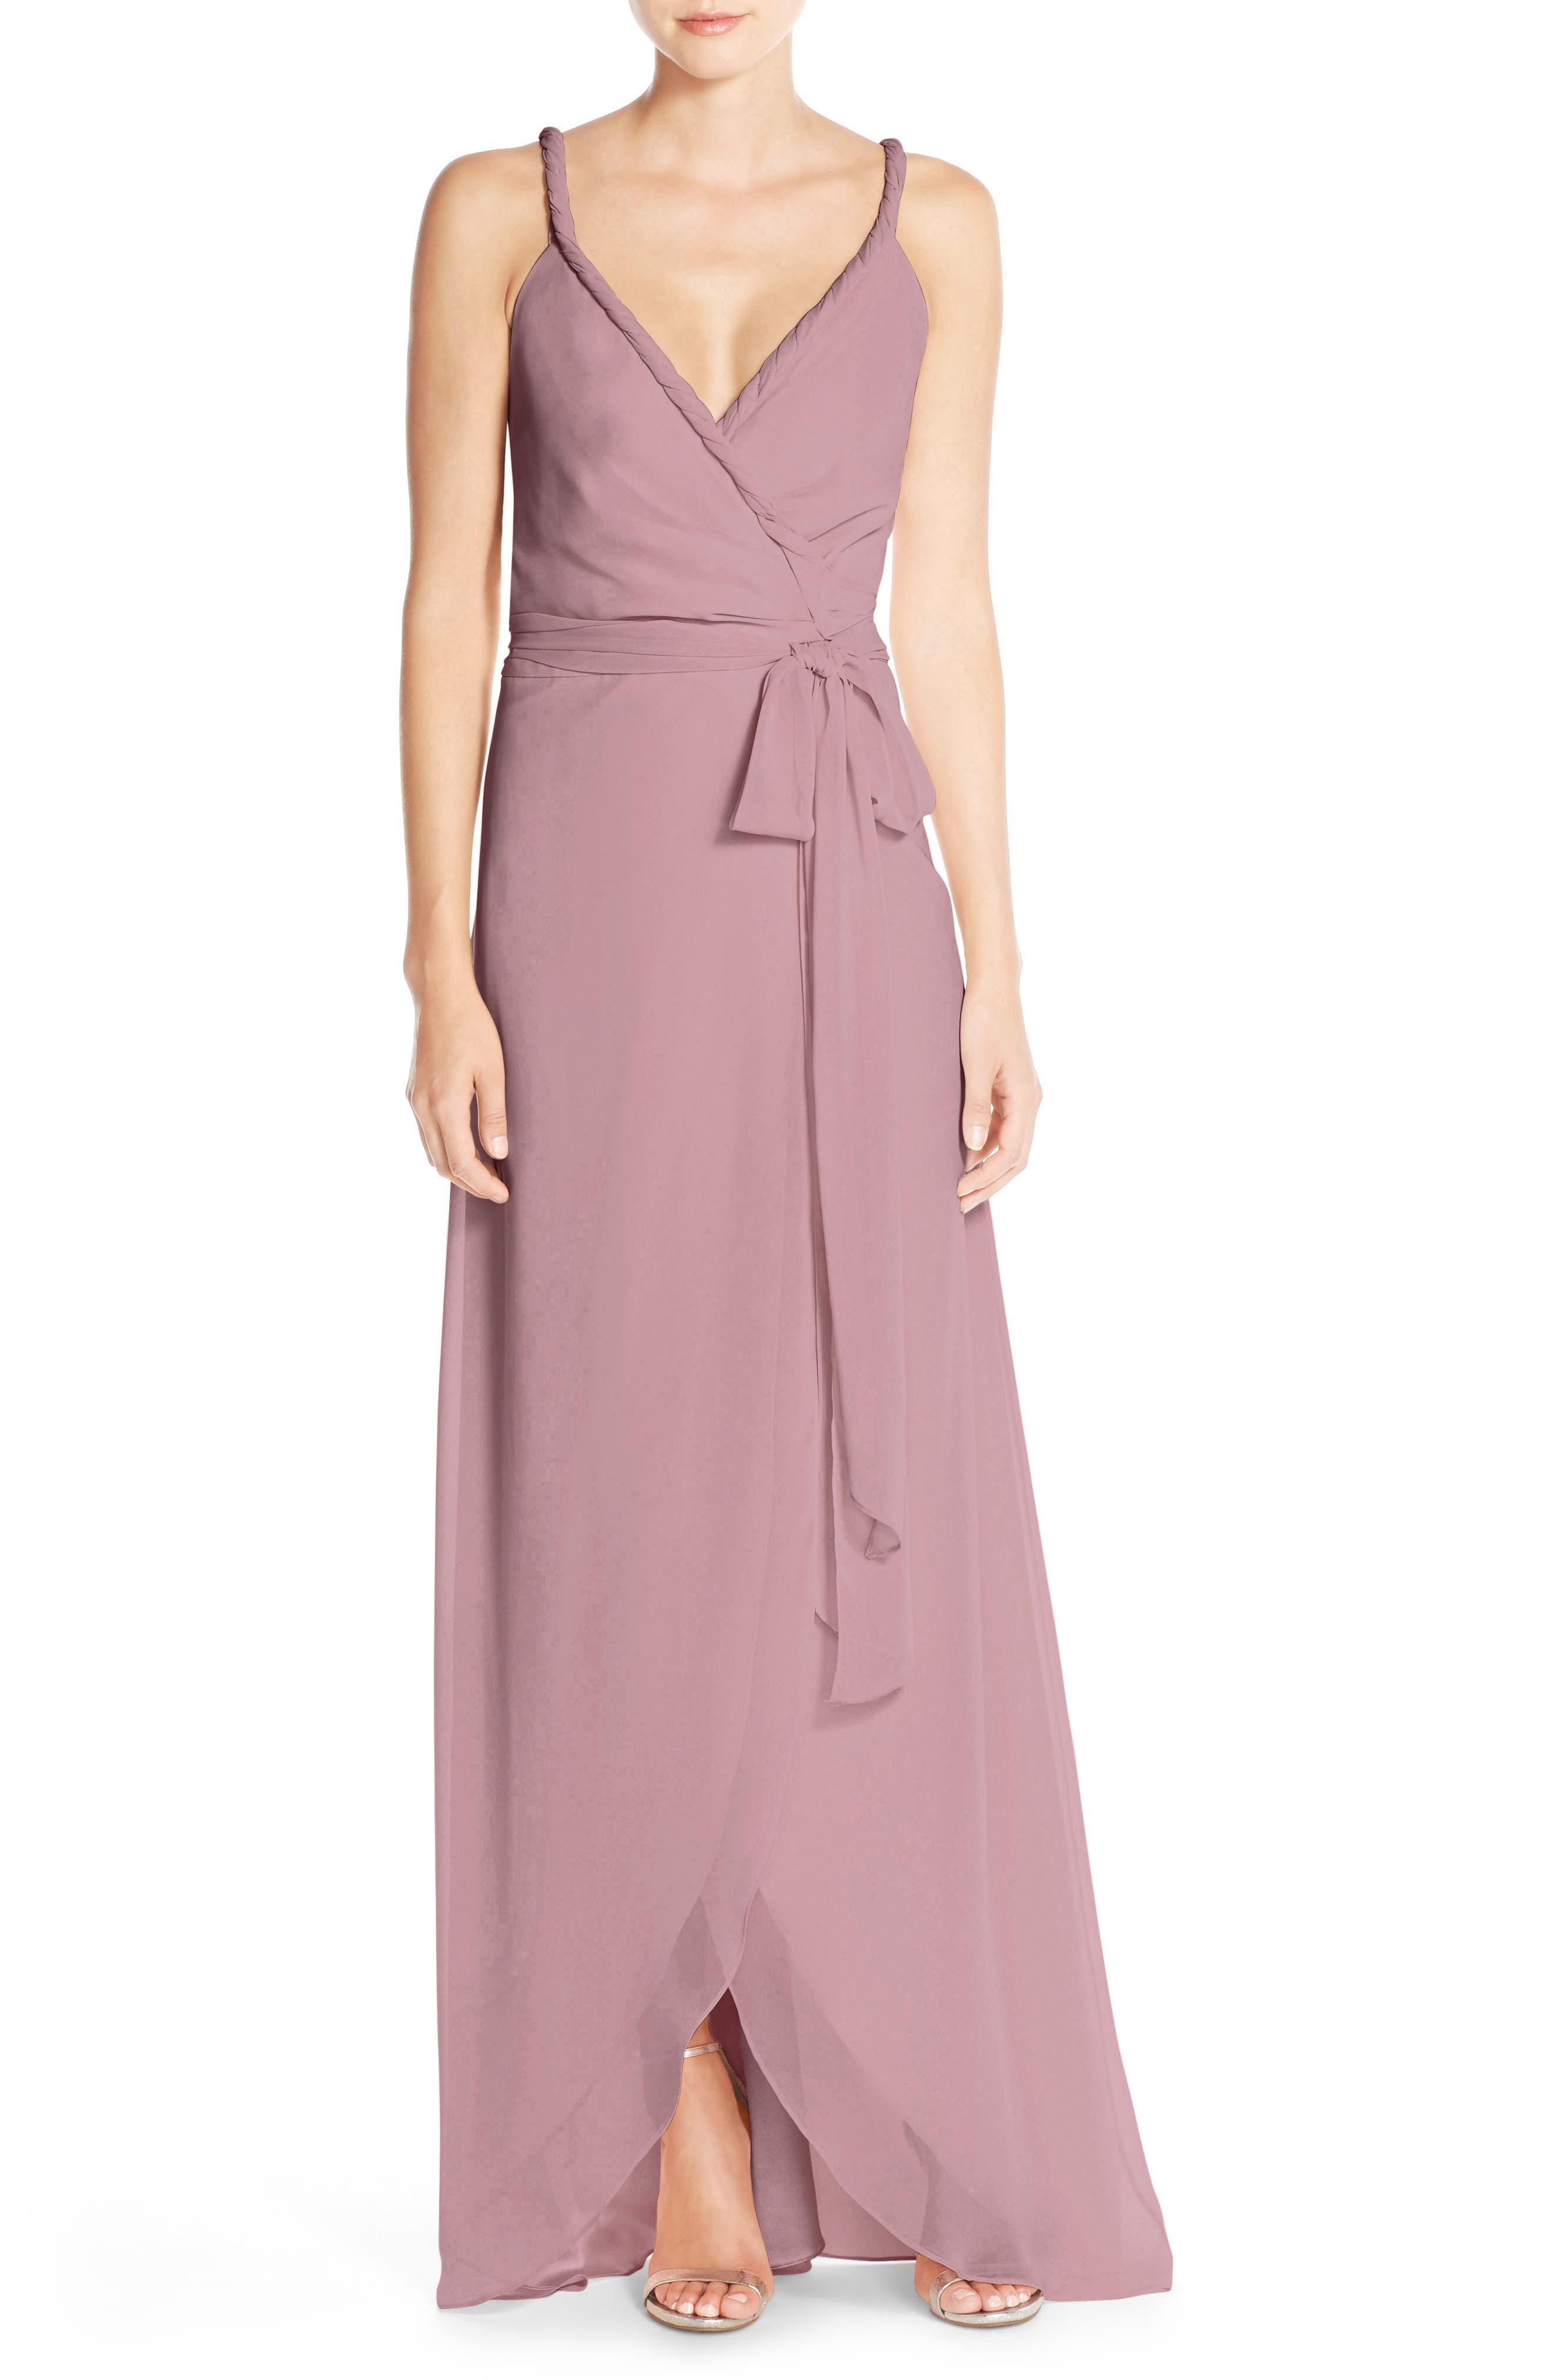 JOANNA AUGUST,                             Parker Twist Strap ChiffonWrap Gown,                             Alternate thumbnail 3, color,                             652